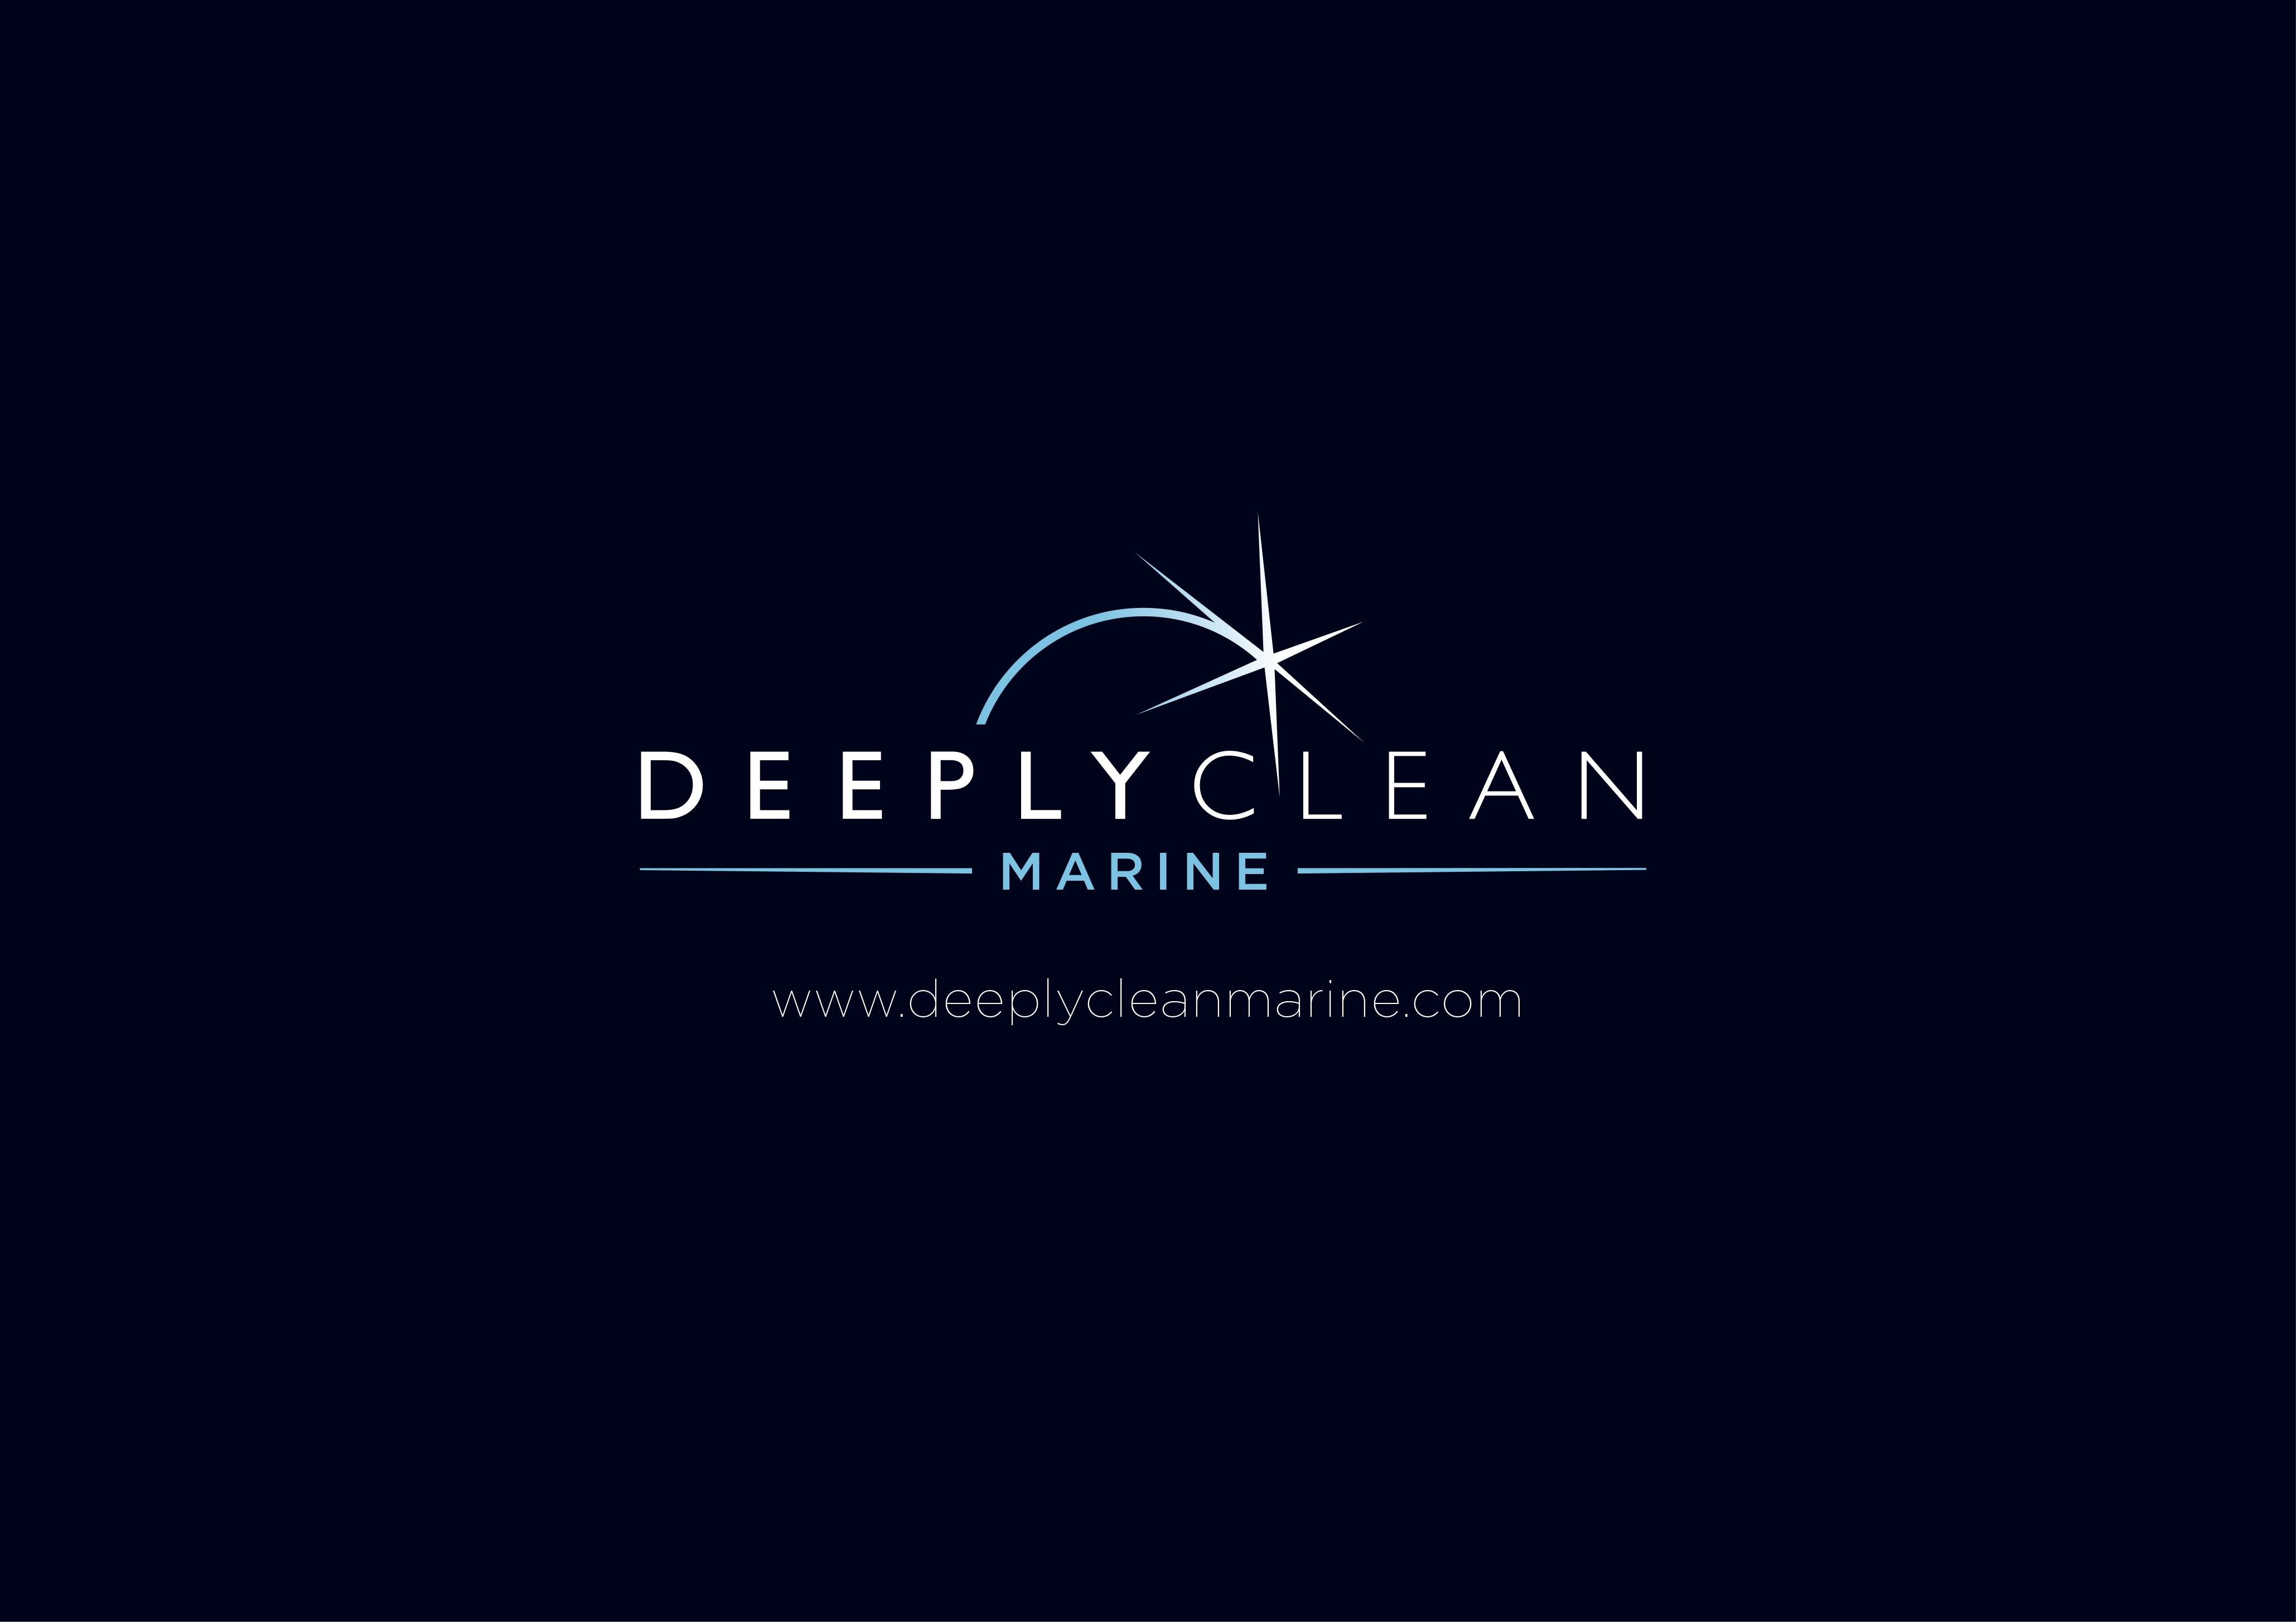 Deeply Clean marine